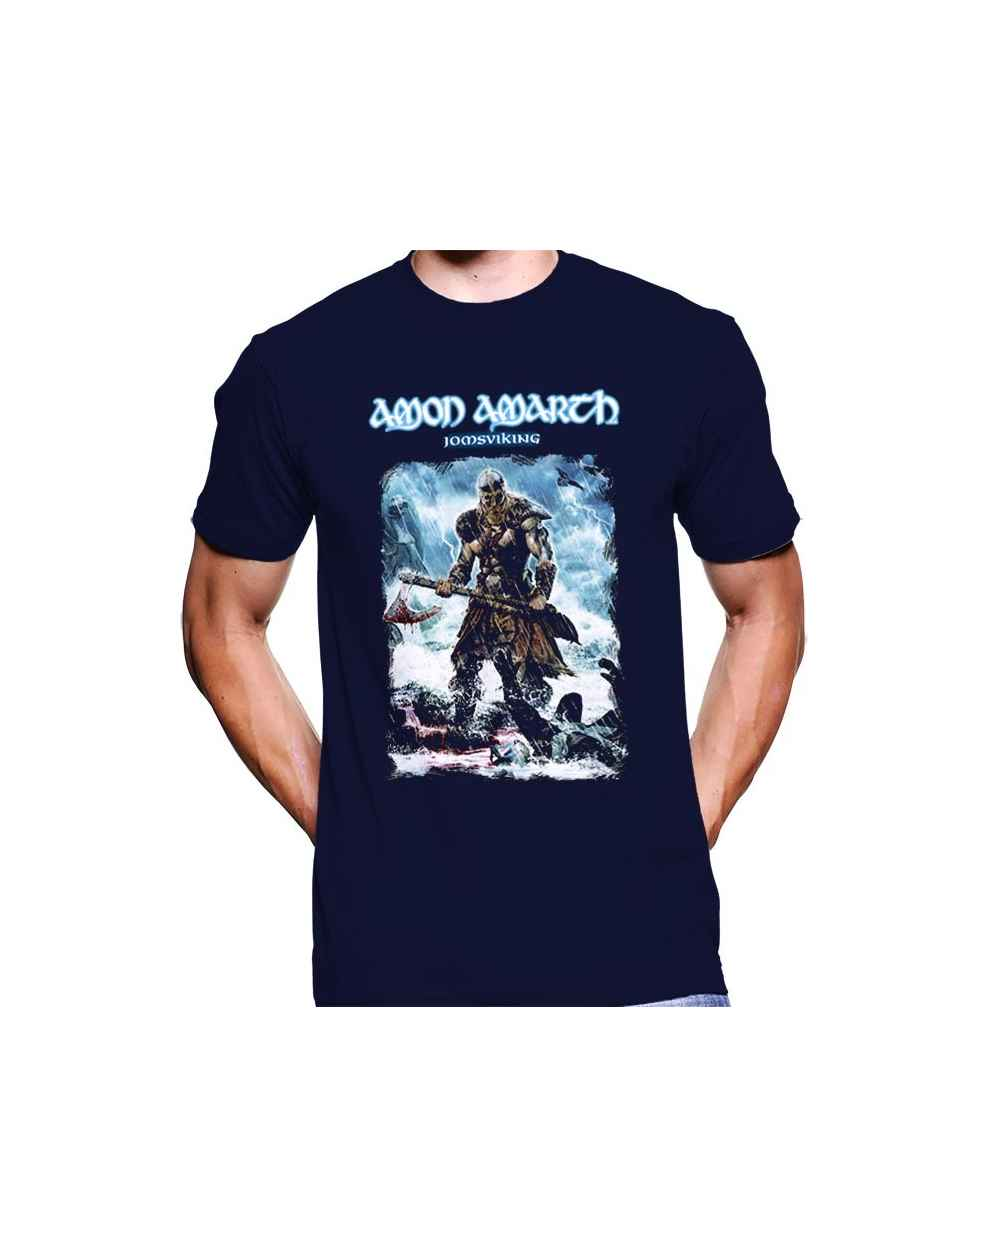 Camiseta Estampada Hombre Amon Amarth 03